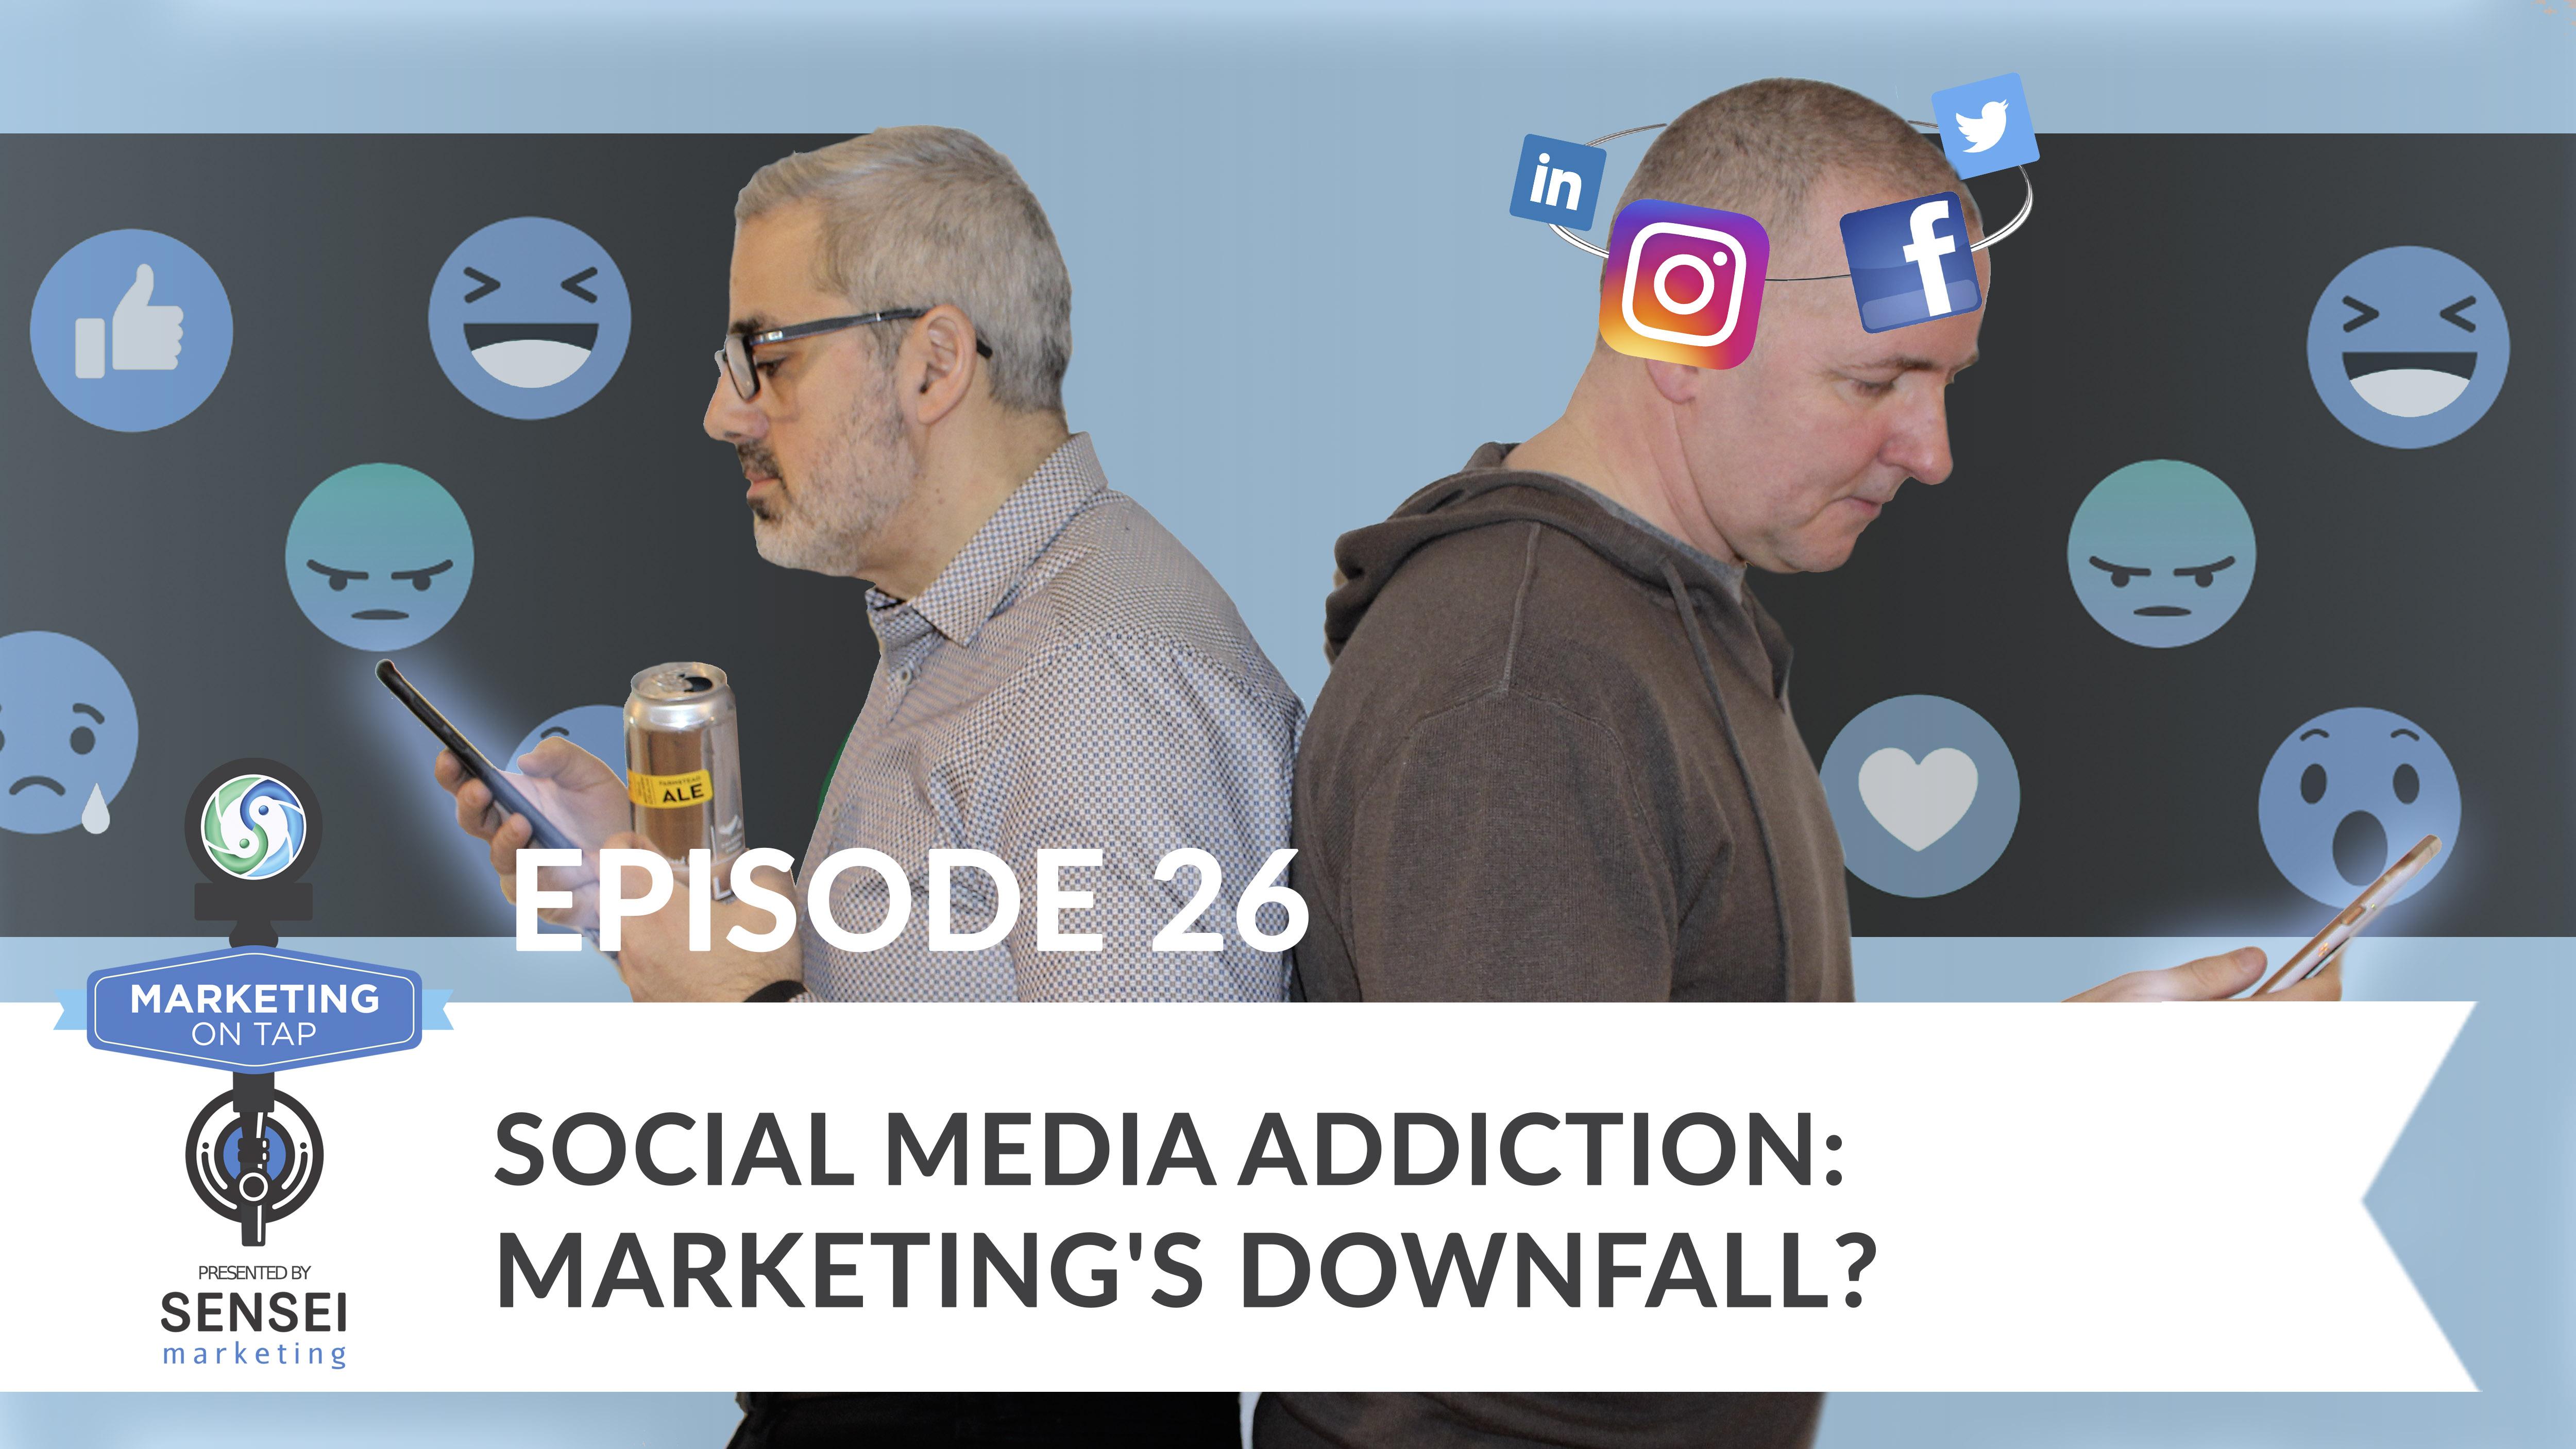 Social Media Addiction - Marketing's Downfall?